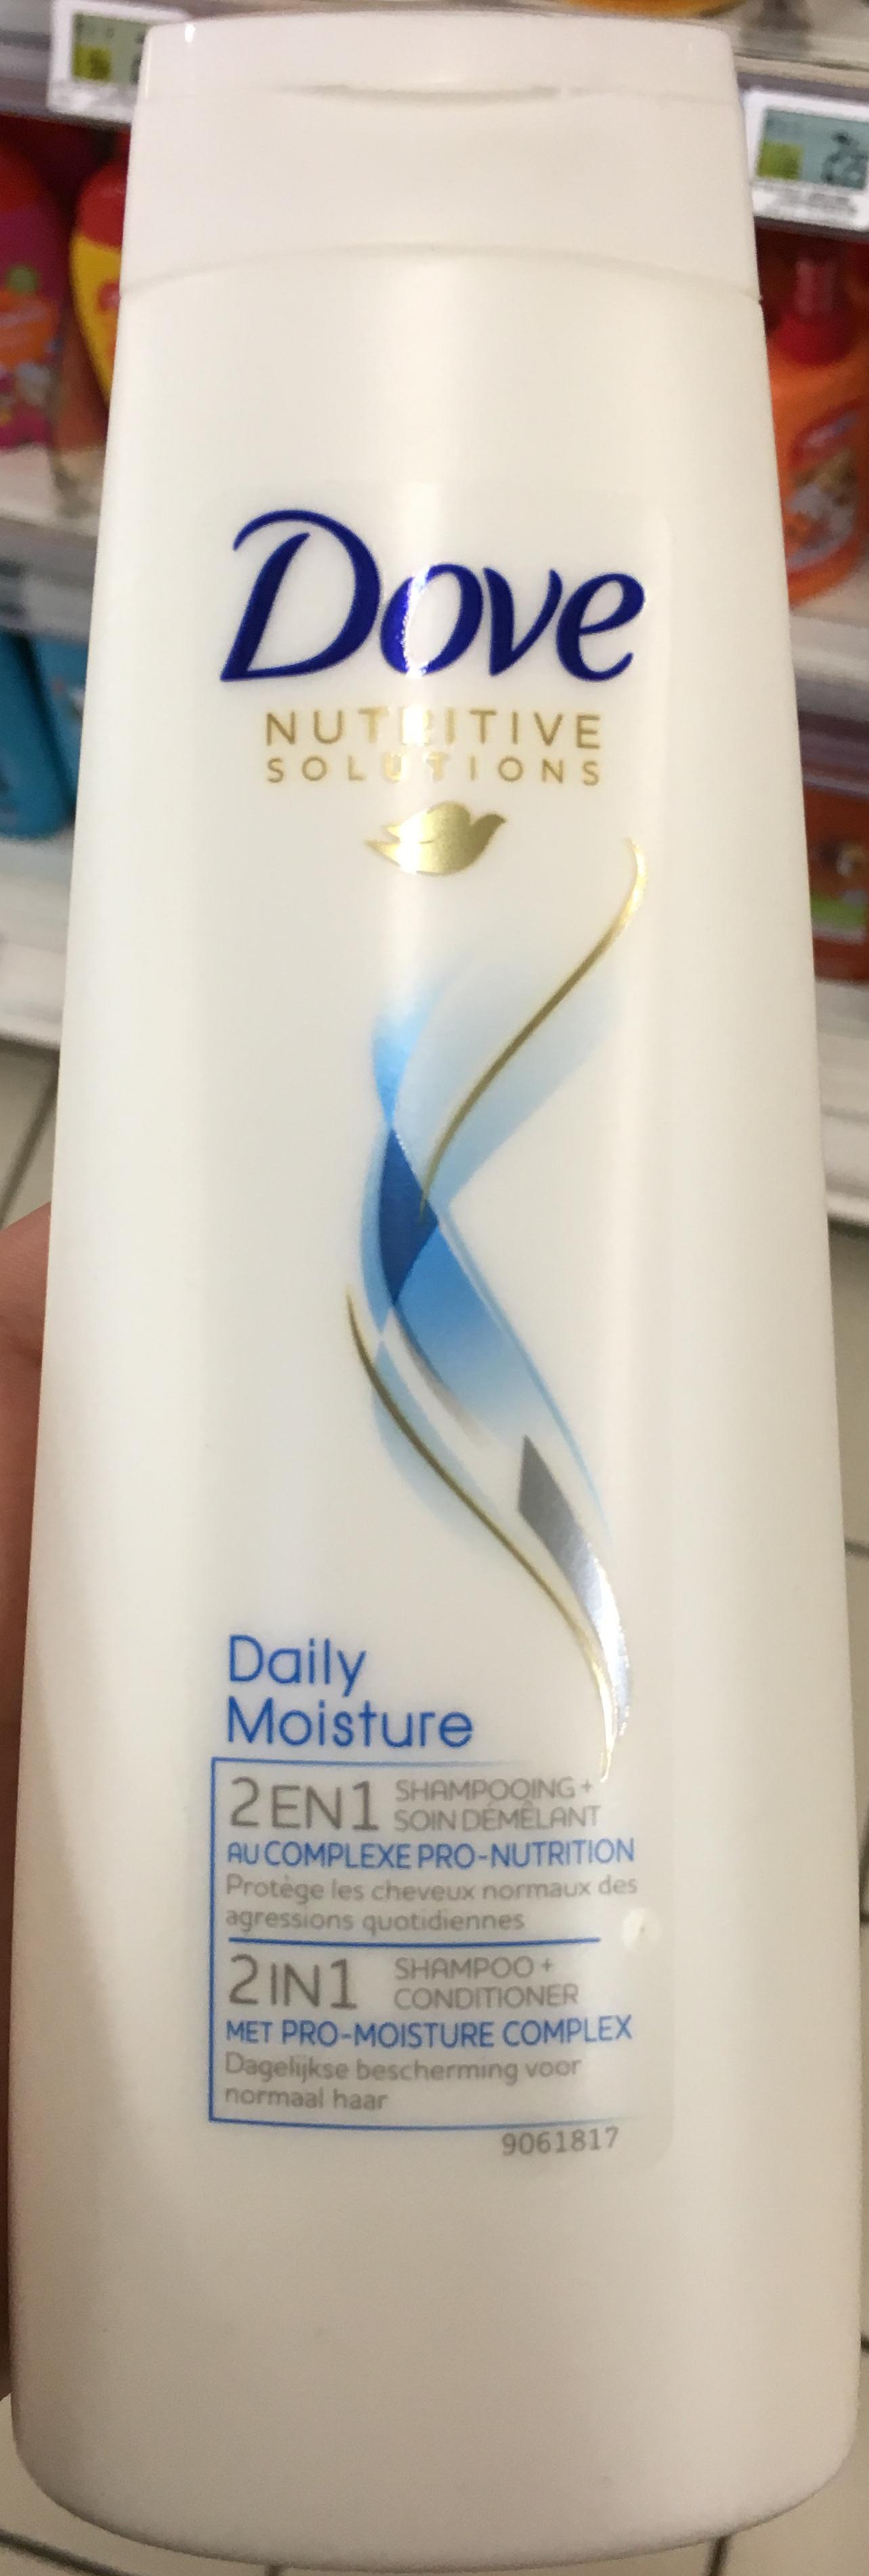 Nutritive Solutions Daily Moisture 2 en 1 Shampooing + Soin démêlant - Produit